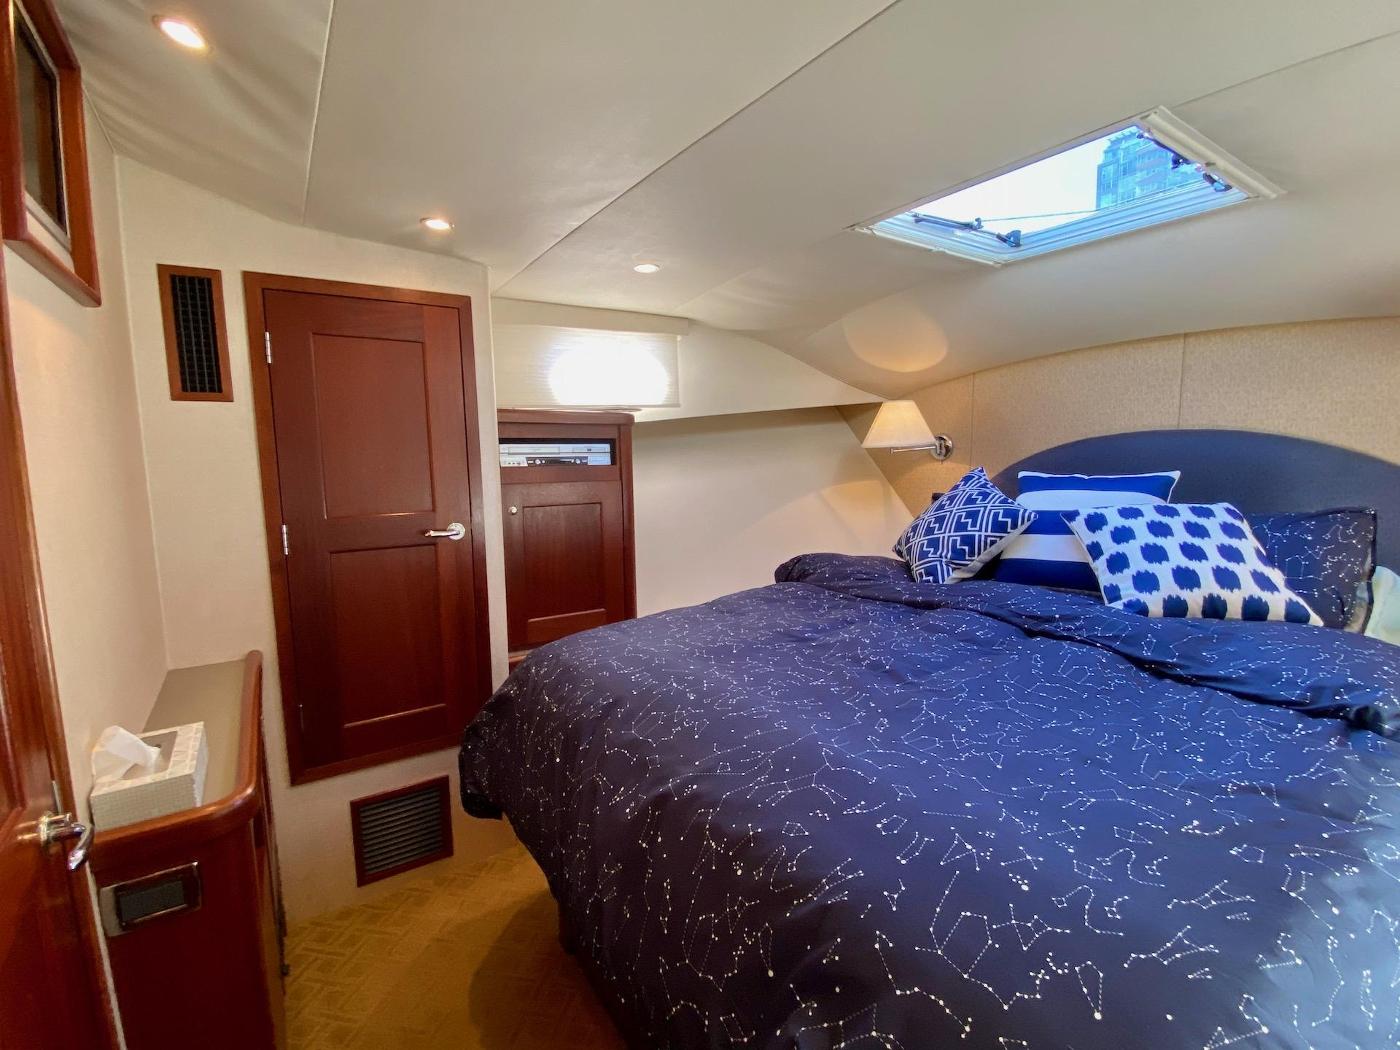 2004 Pacific Mariner 65 Diamond, Forward guest cabin